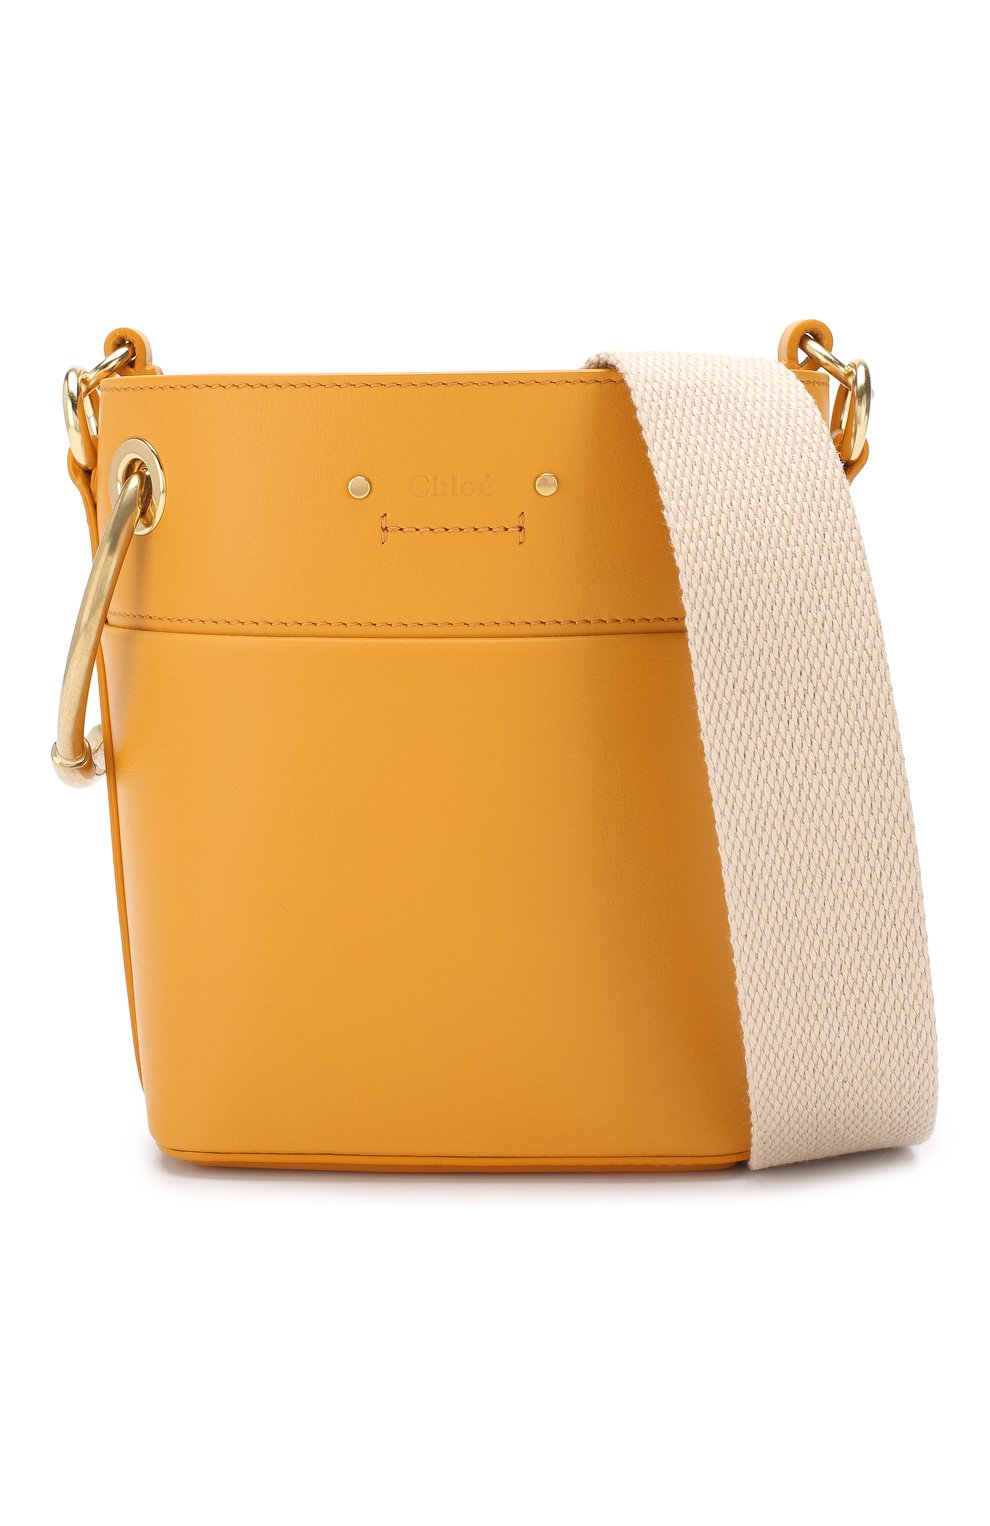 Сумка Roy Bucket mini Chloé желтая цвета | Фото №6